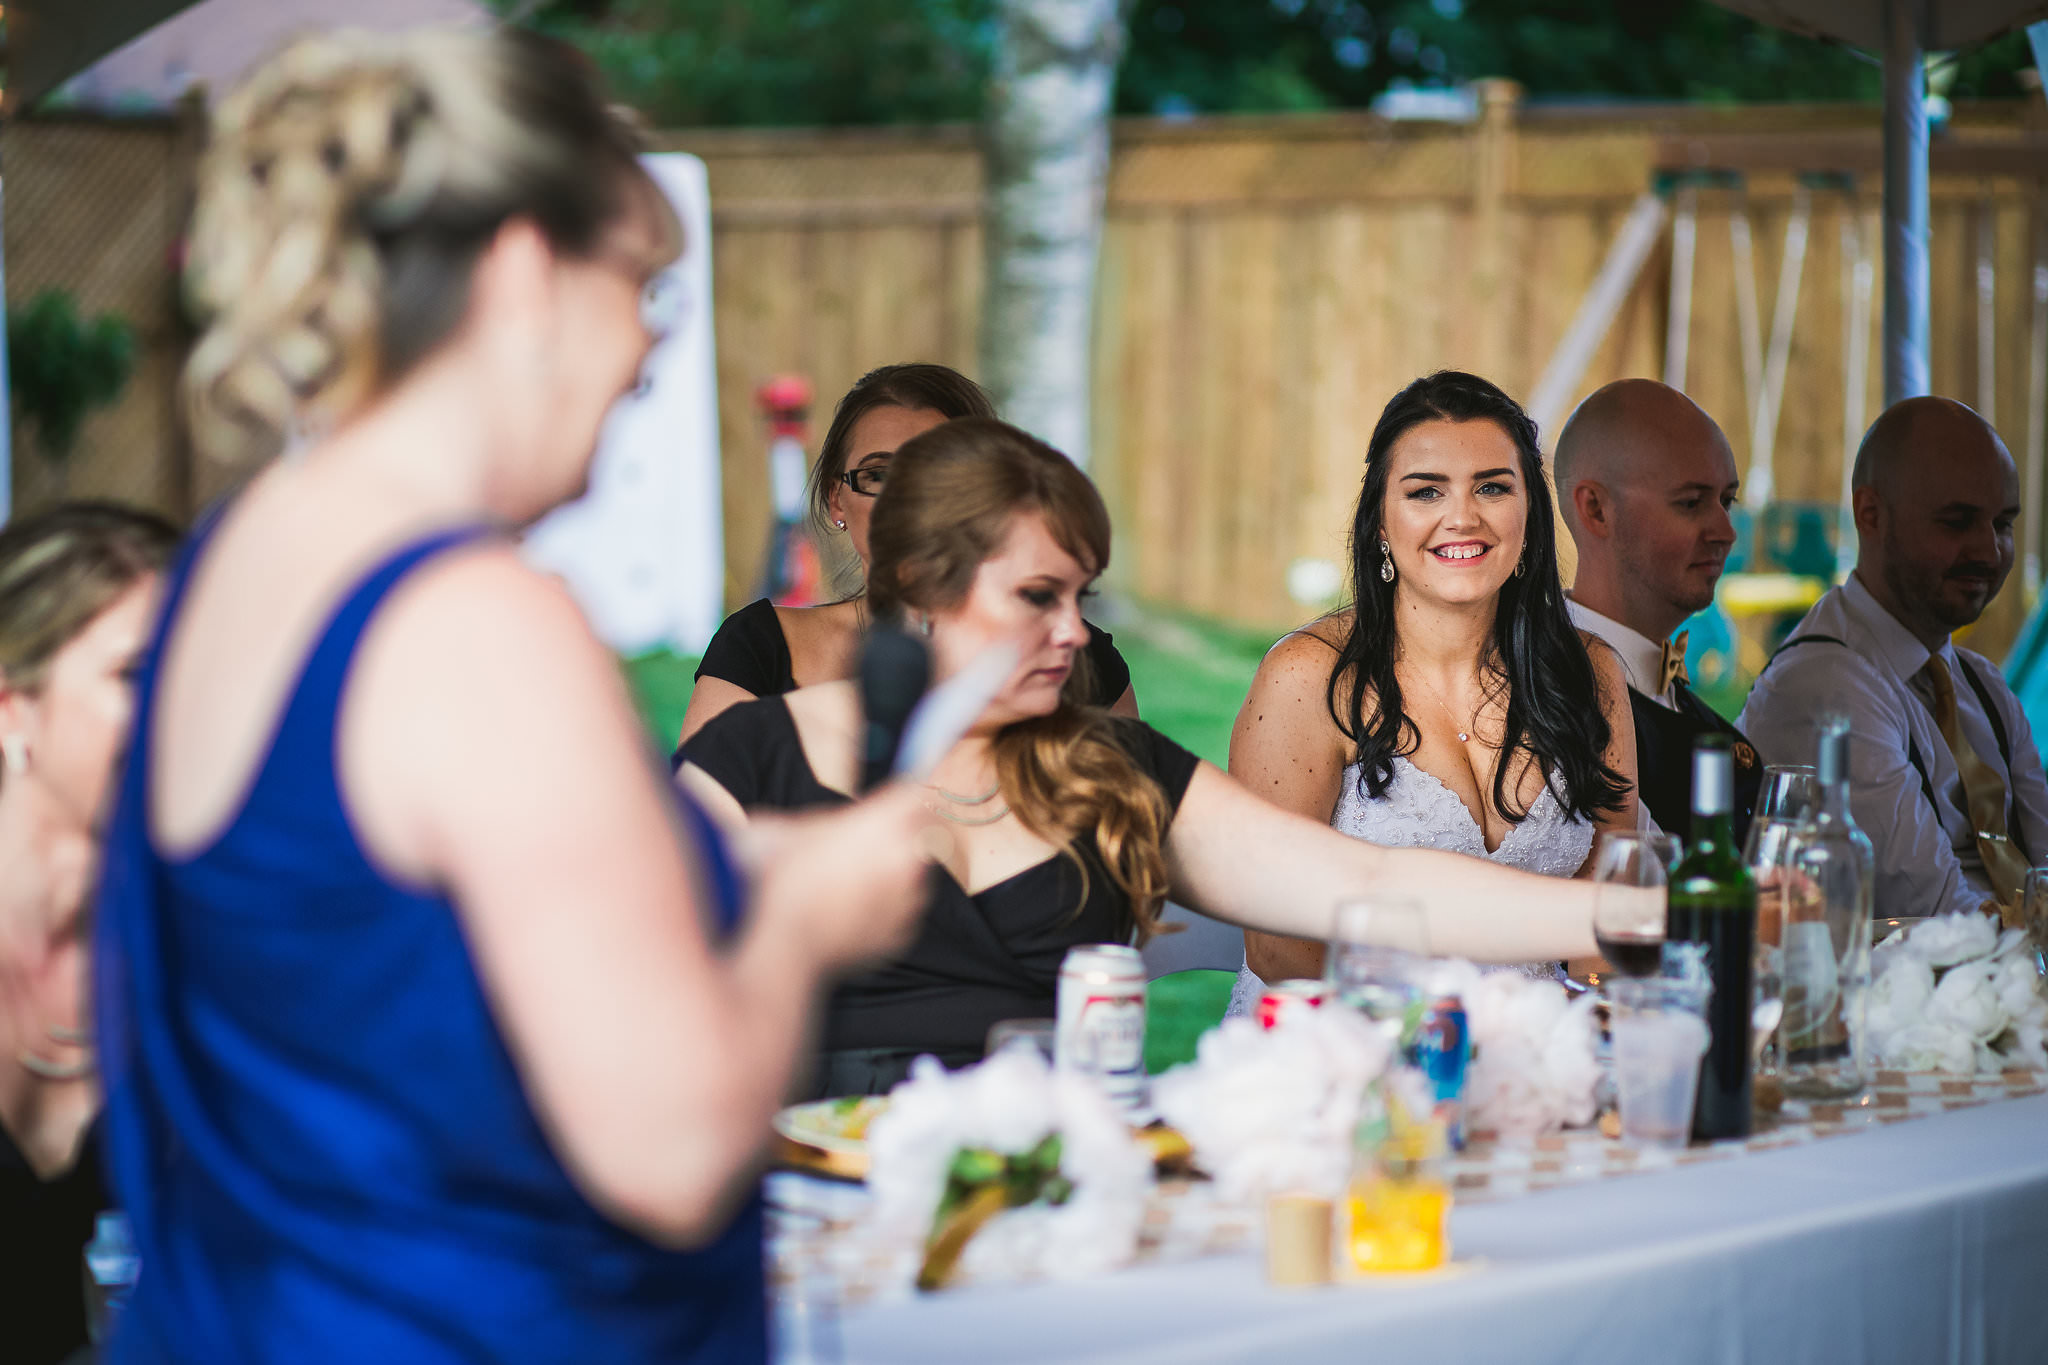 Kristen Adam Kindred Loft Whitby Wedding Photos 492 - Durham Wedding Photographer: Kindred Loft Wedding Photos